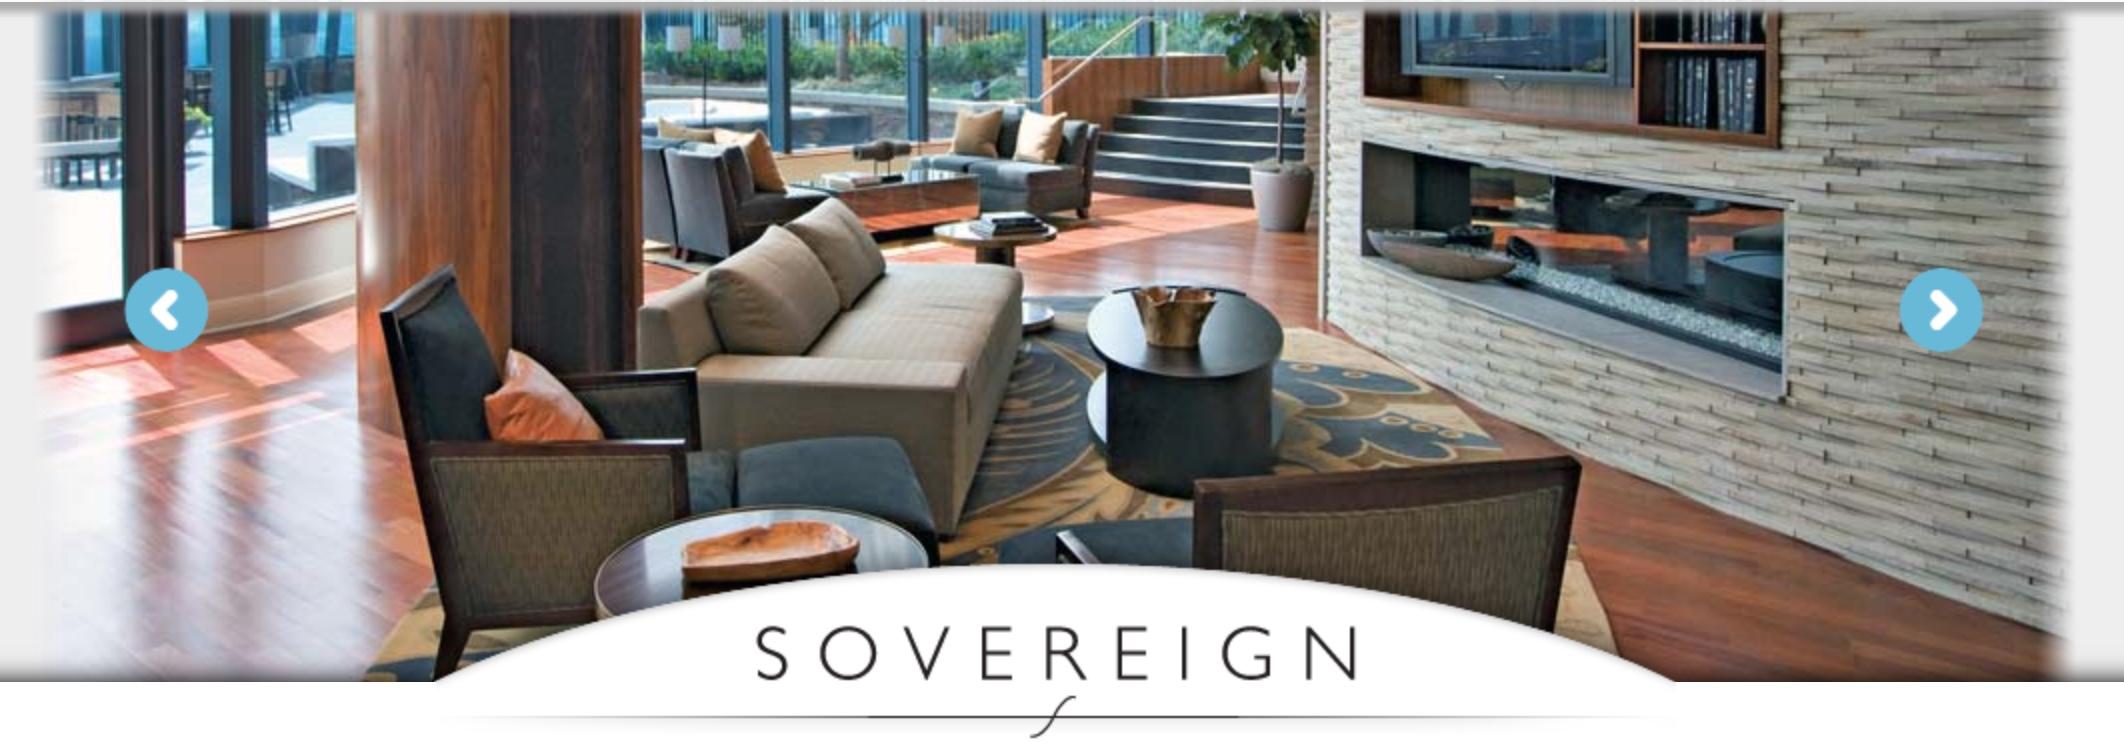 sovereign 1.jpeg